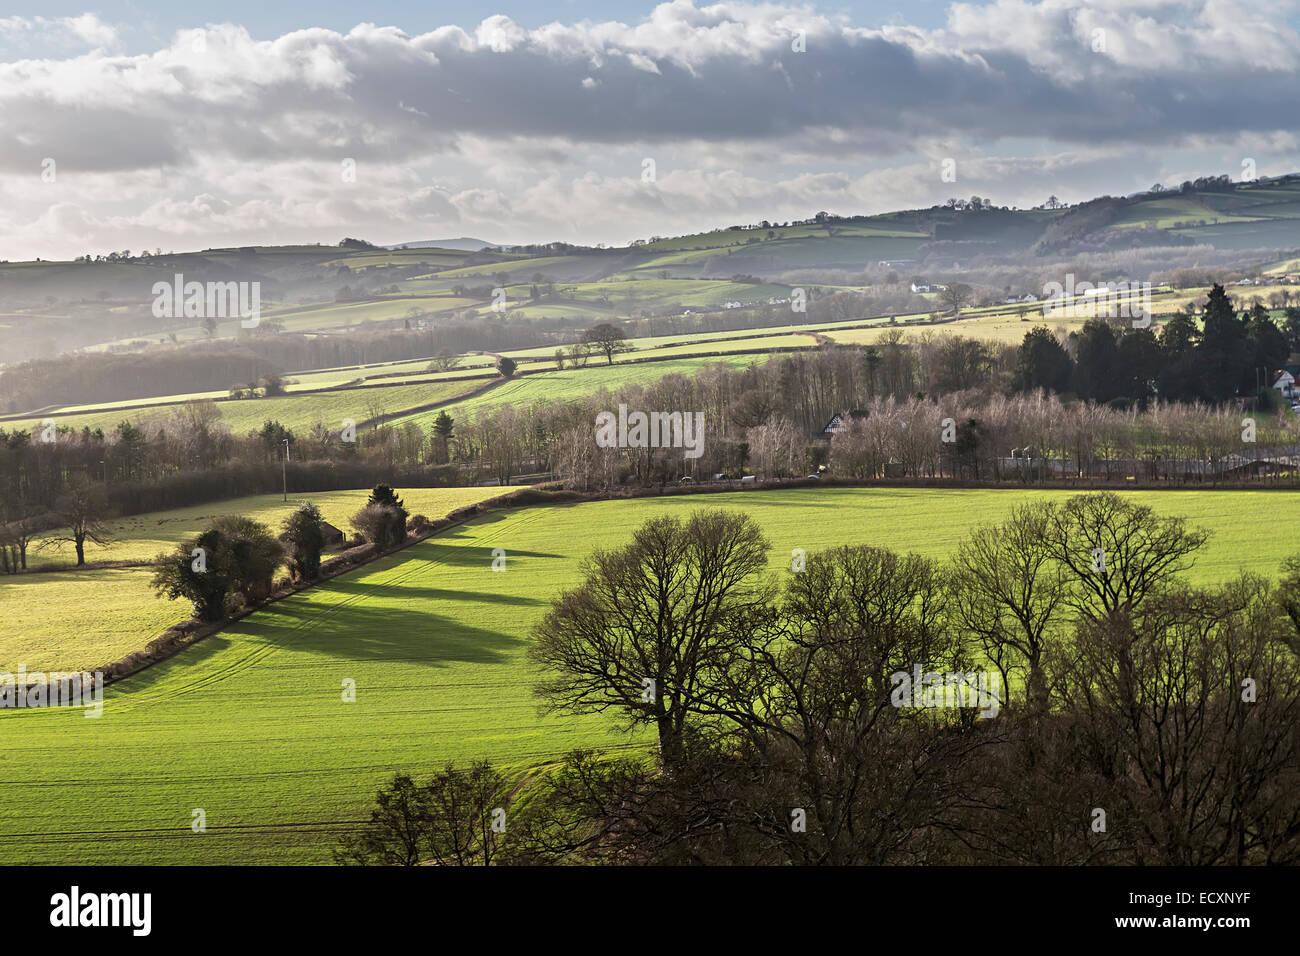 Landscape over fields at Raglan, Wales, UK - Stock Image